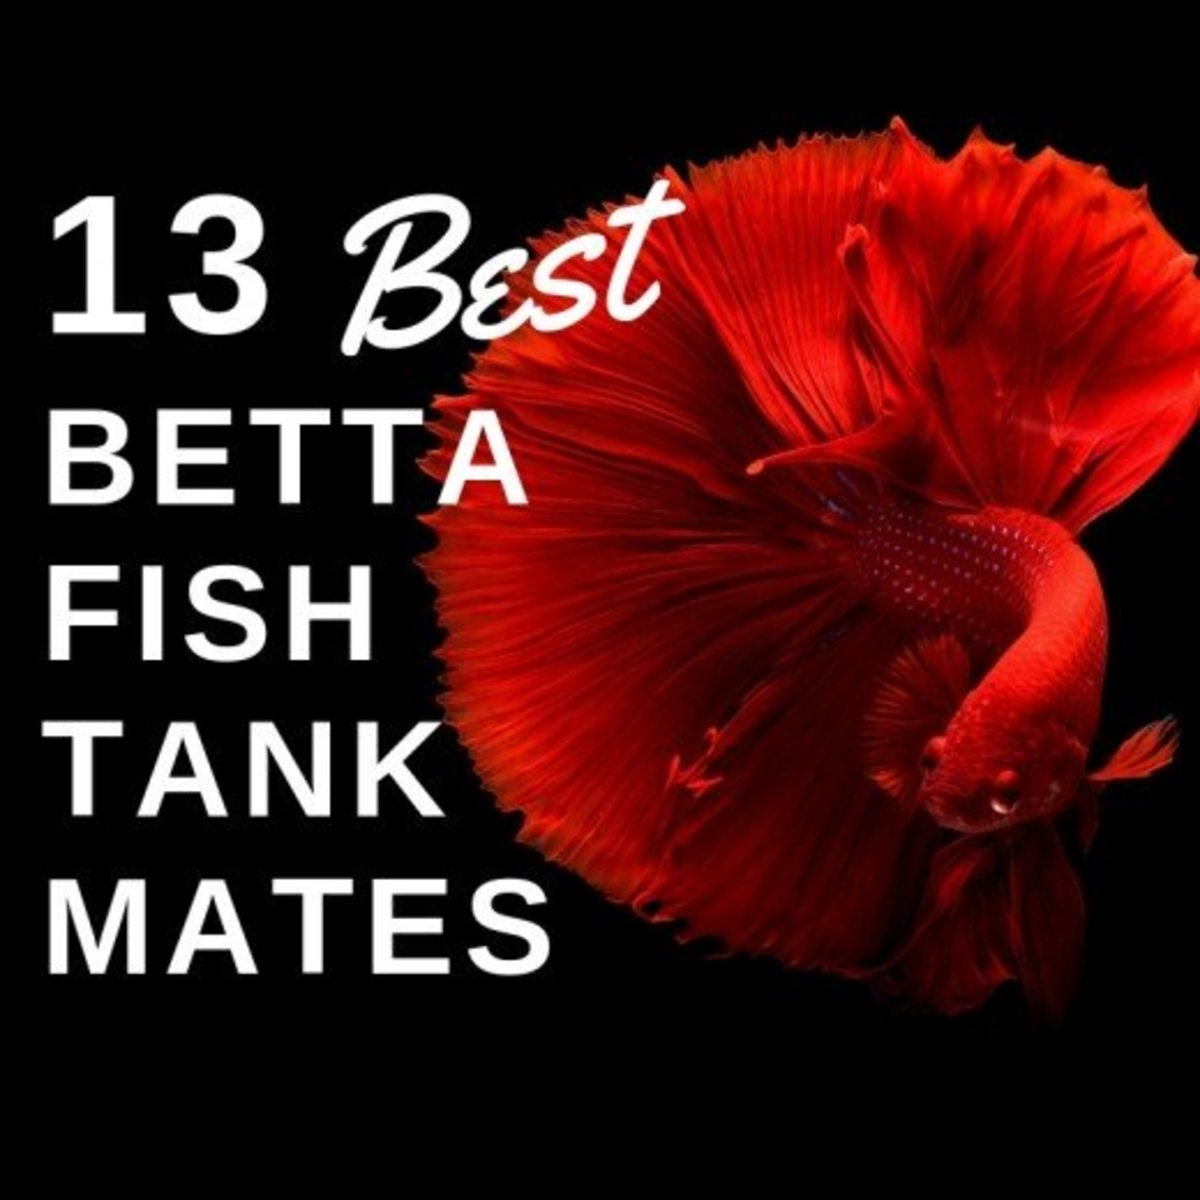 13 Safe and Compatible Betta Fish Tank Mates